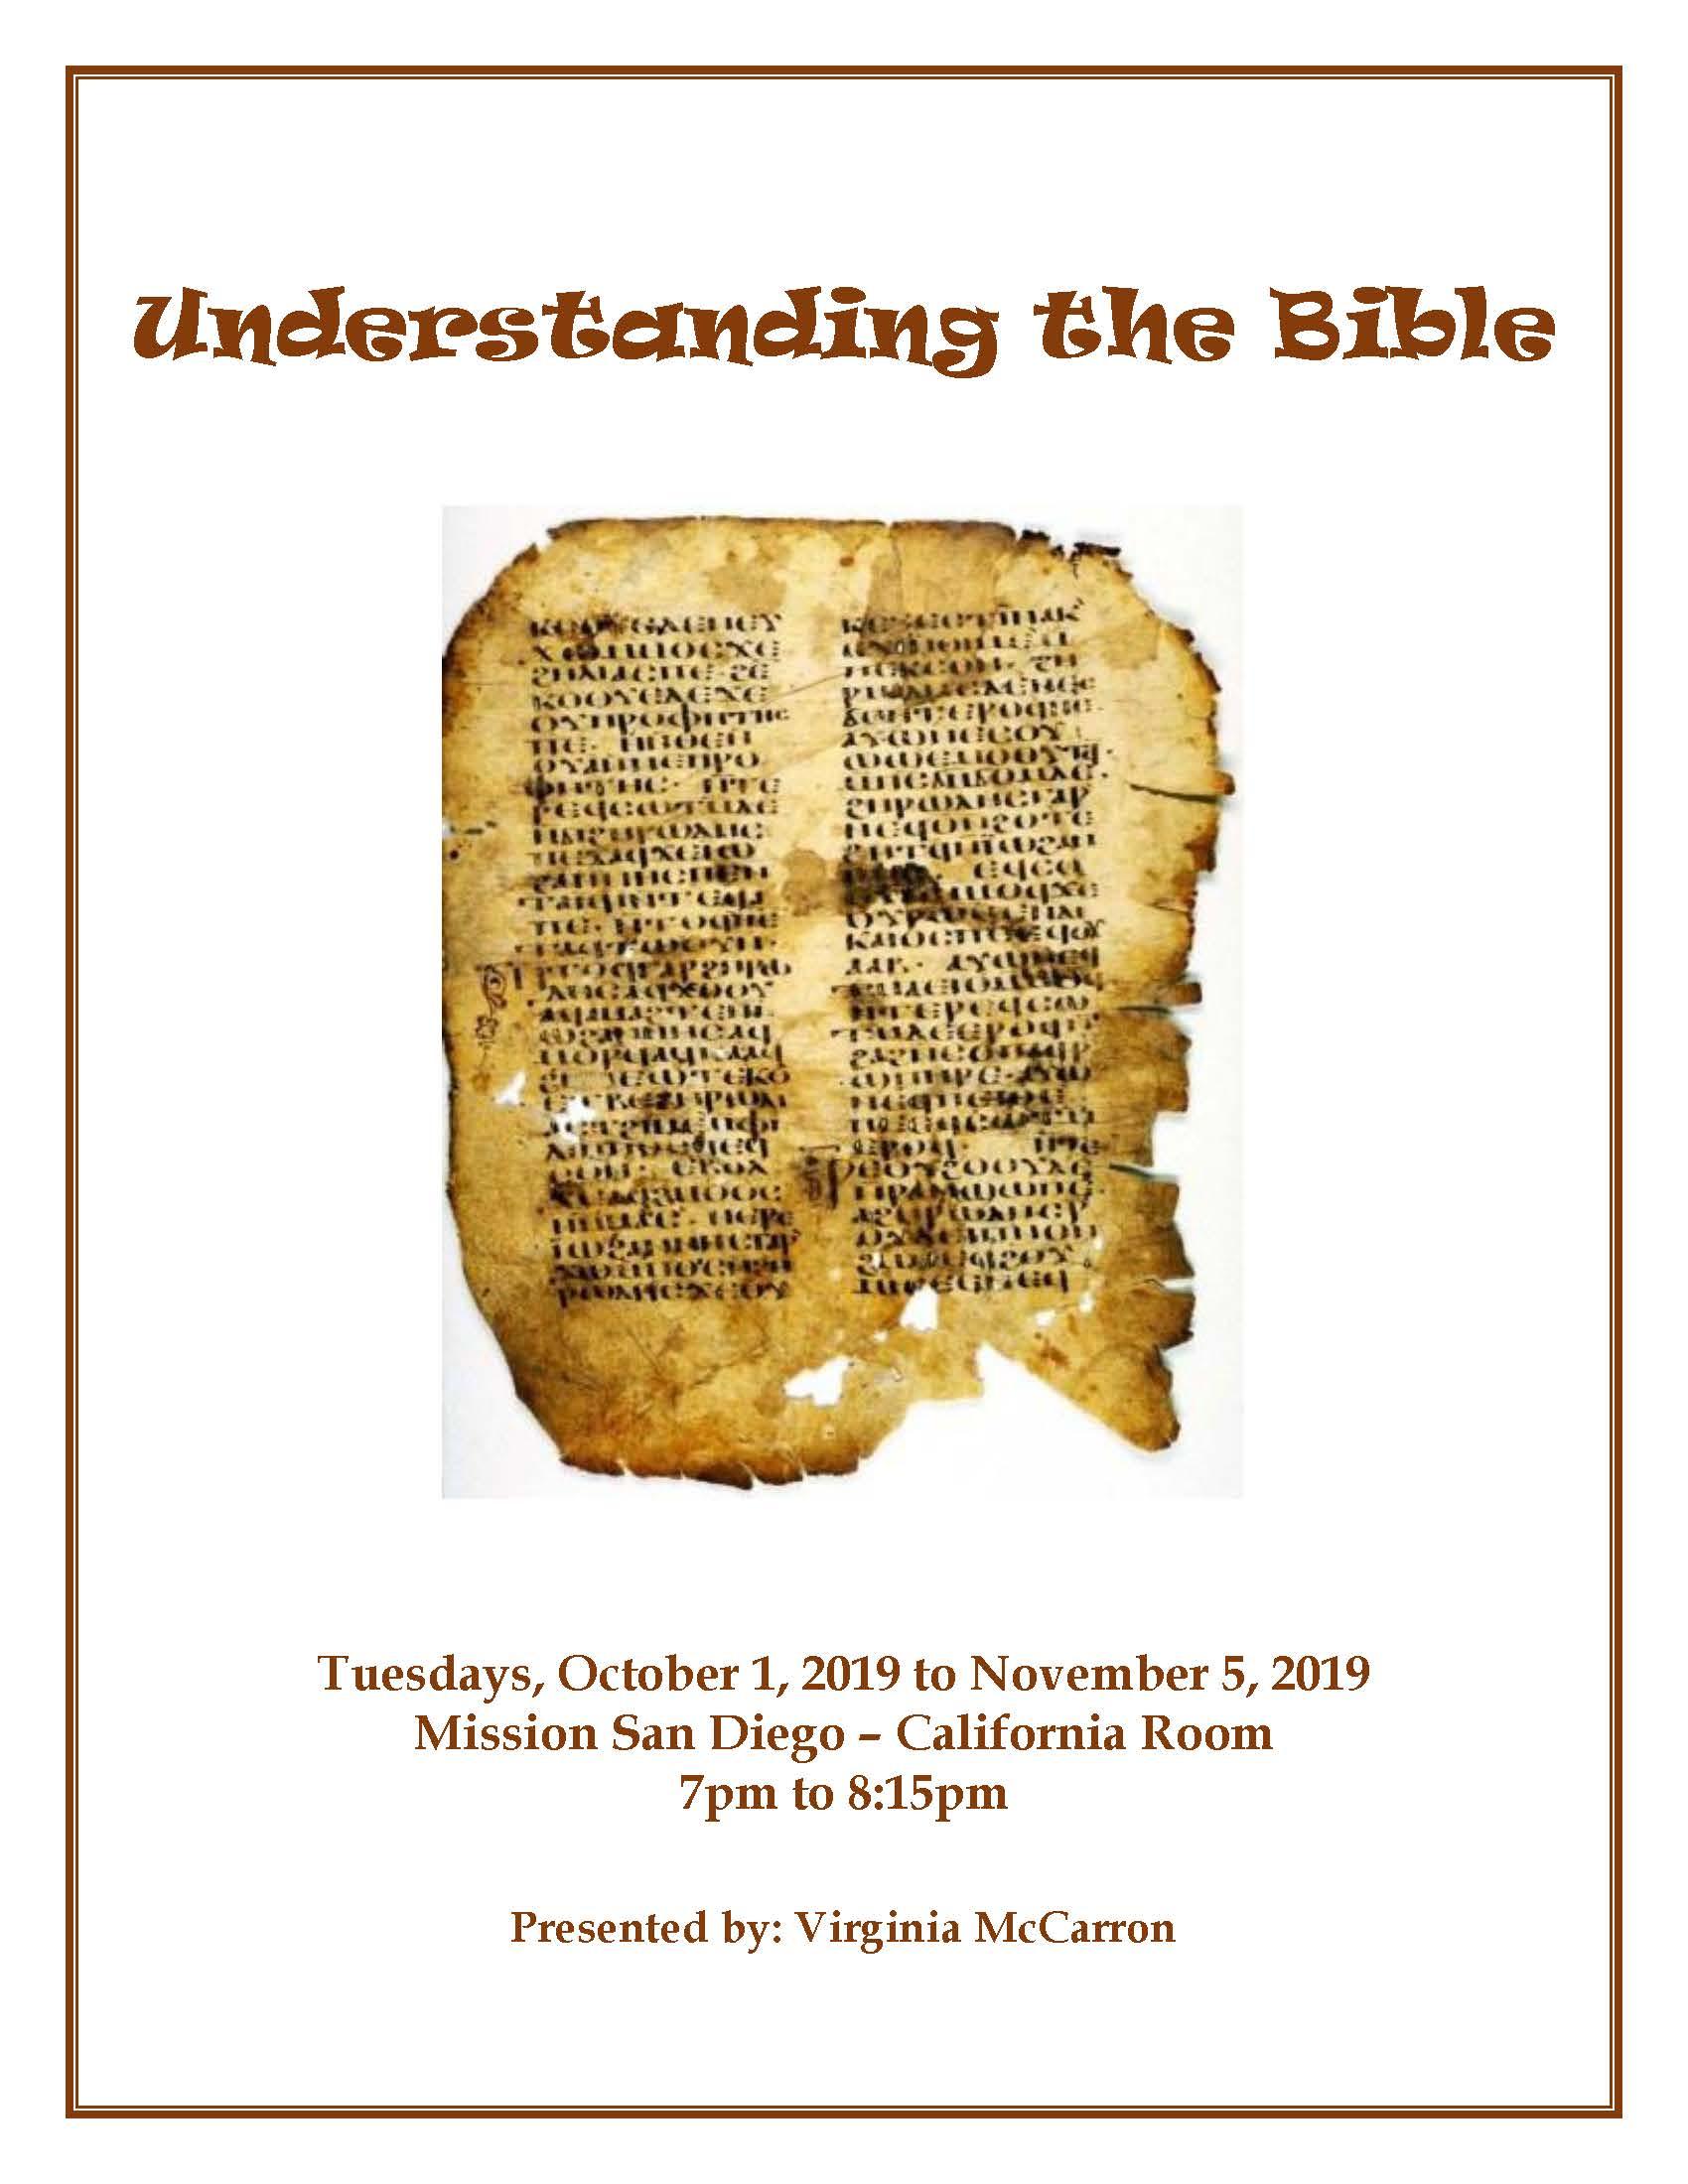 Understanding the Bible presented by Virginia McCarron